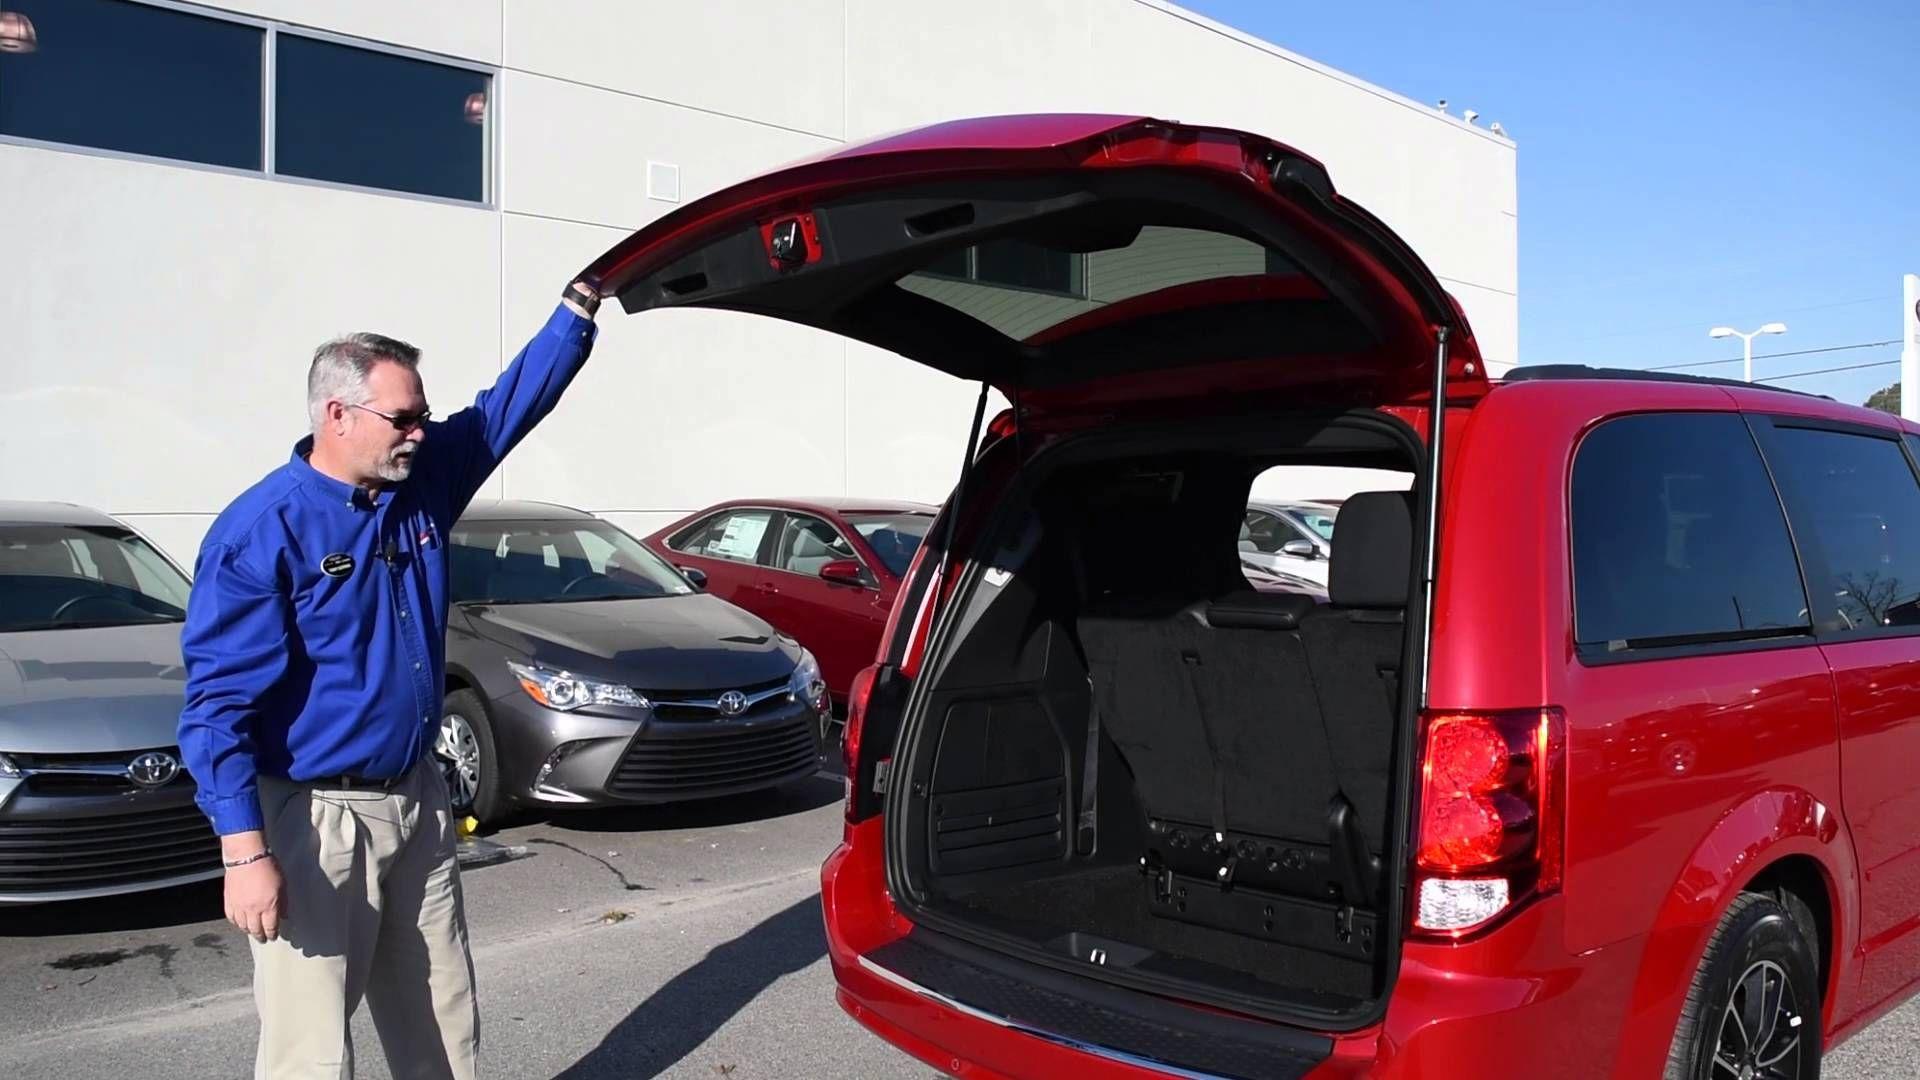 More About Dodge Caravan And Dodge Caravan Trunk Space The 2016 Grand Caravan With Tony Sutphin Local Markham Grand Caravan 2016 Dodge Grand Caravan Caravan